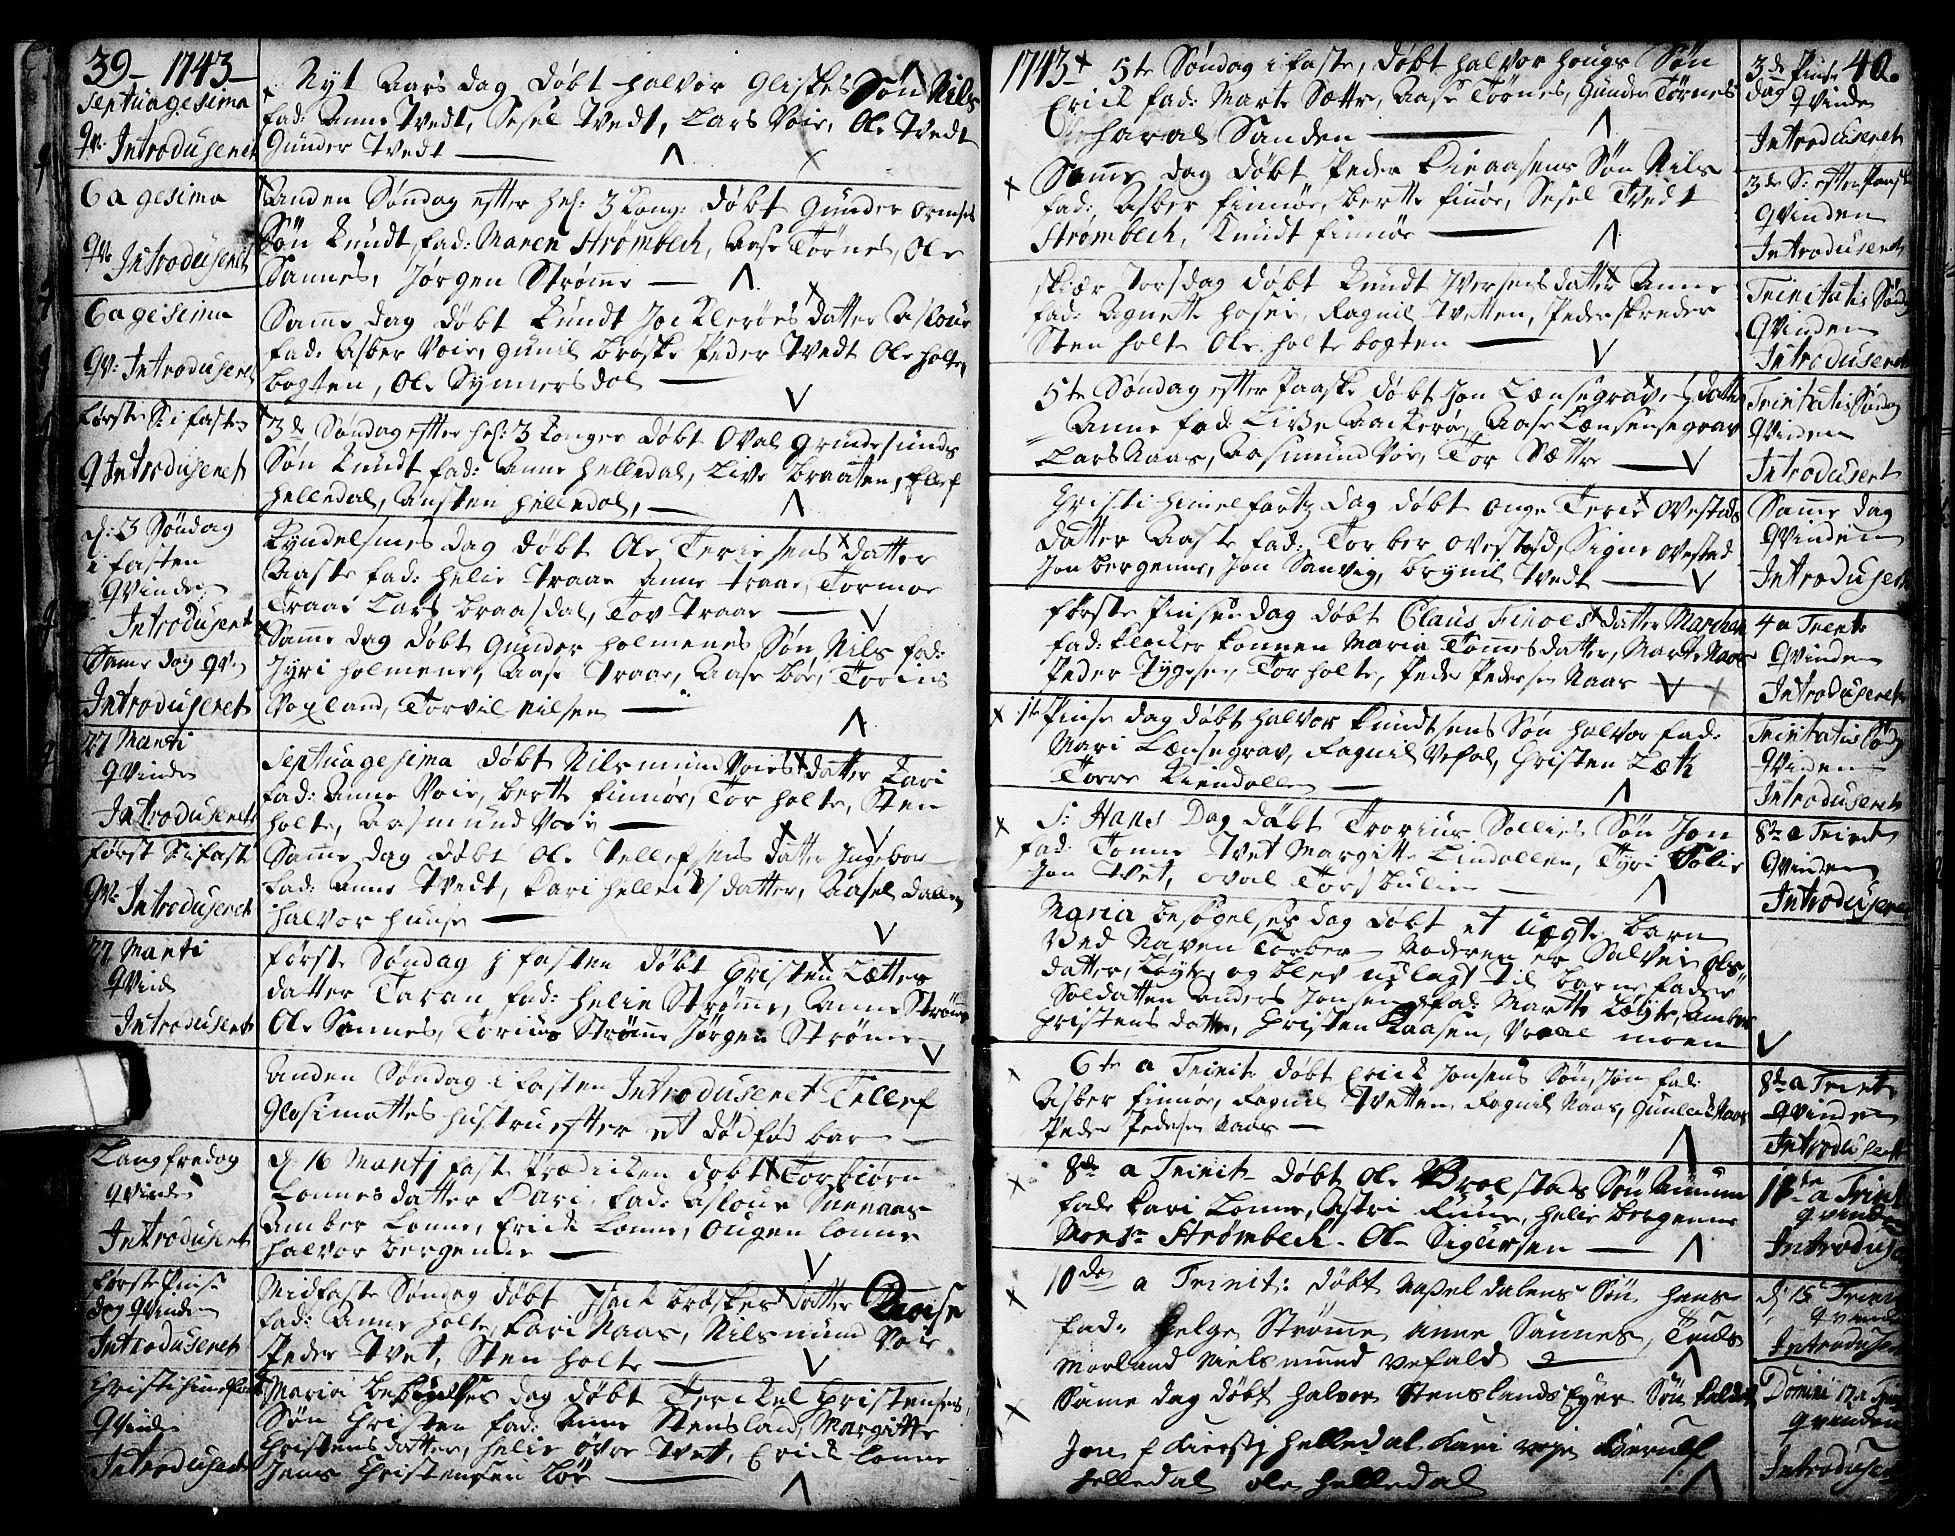 SAKO, Drangedal kirkebøker, F/Fa/L0002: Ministerialbok nr. 2, 1733-1753, s. 39-40